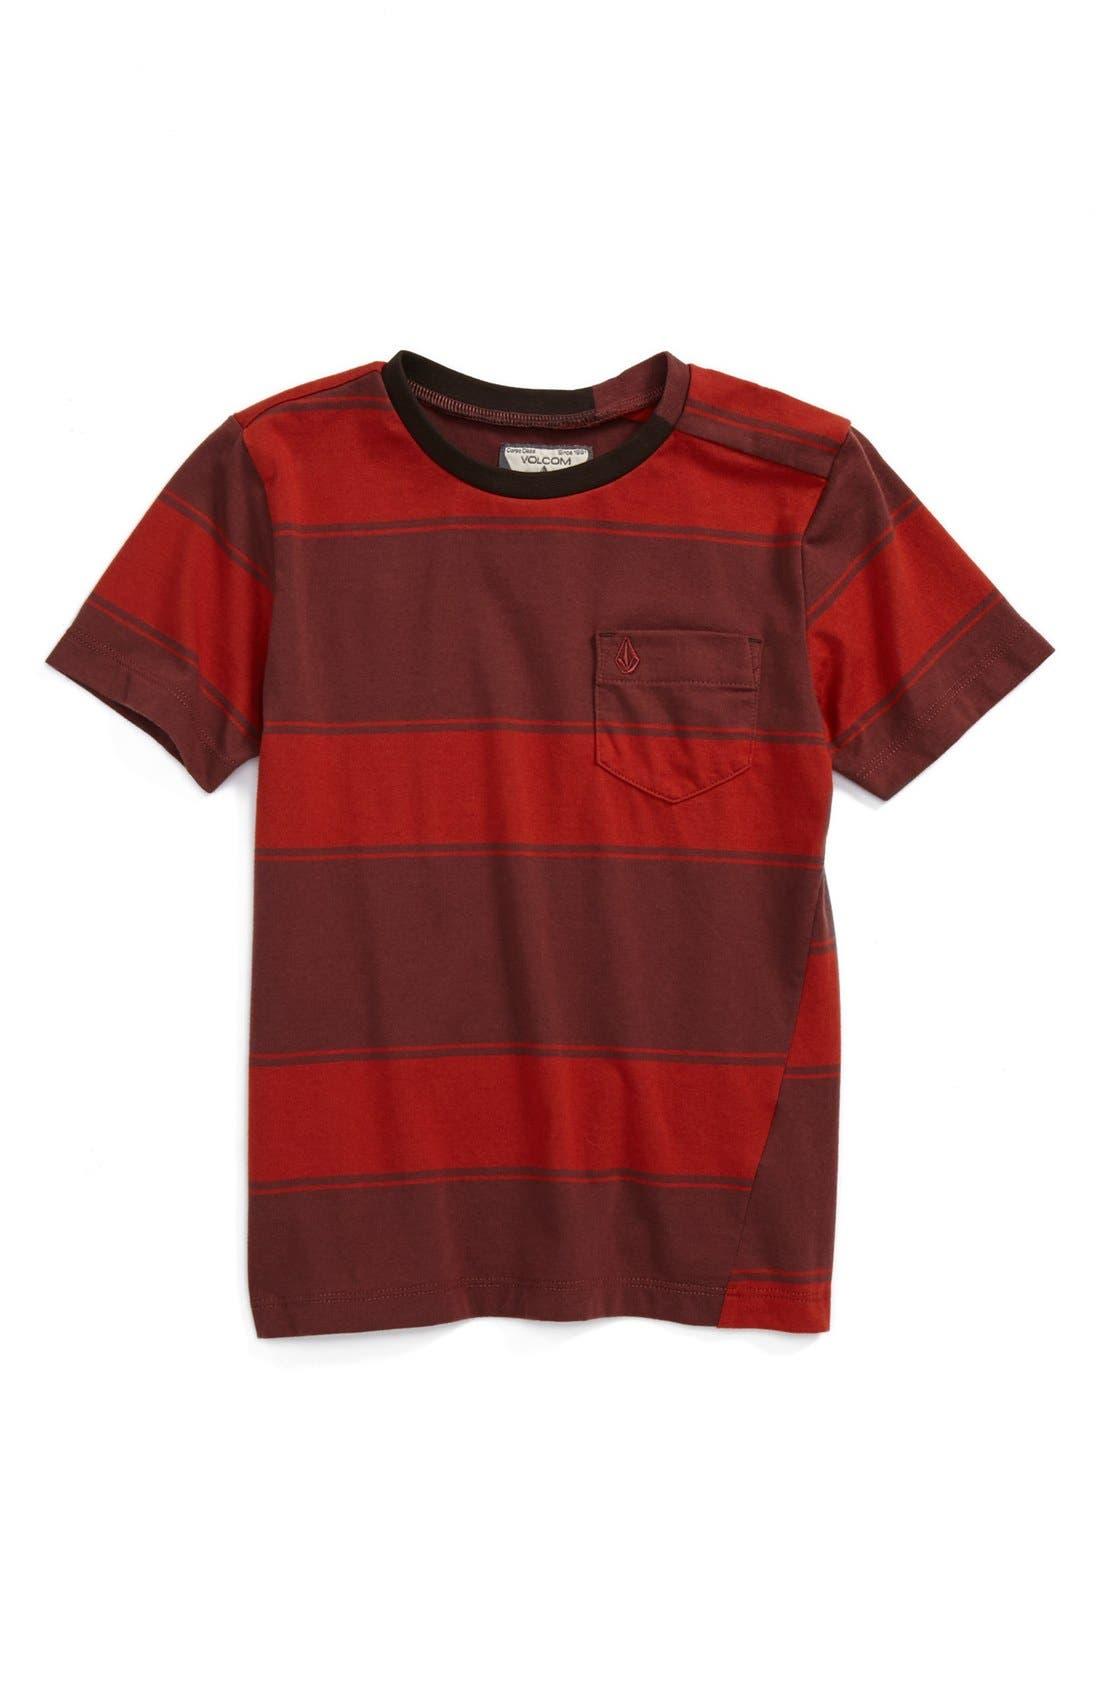 Main Image - Volcom 'Square' T-Shirt (Little Boys)